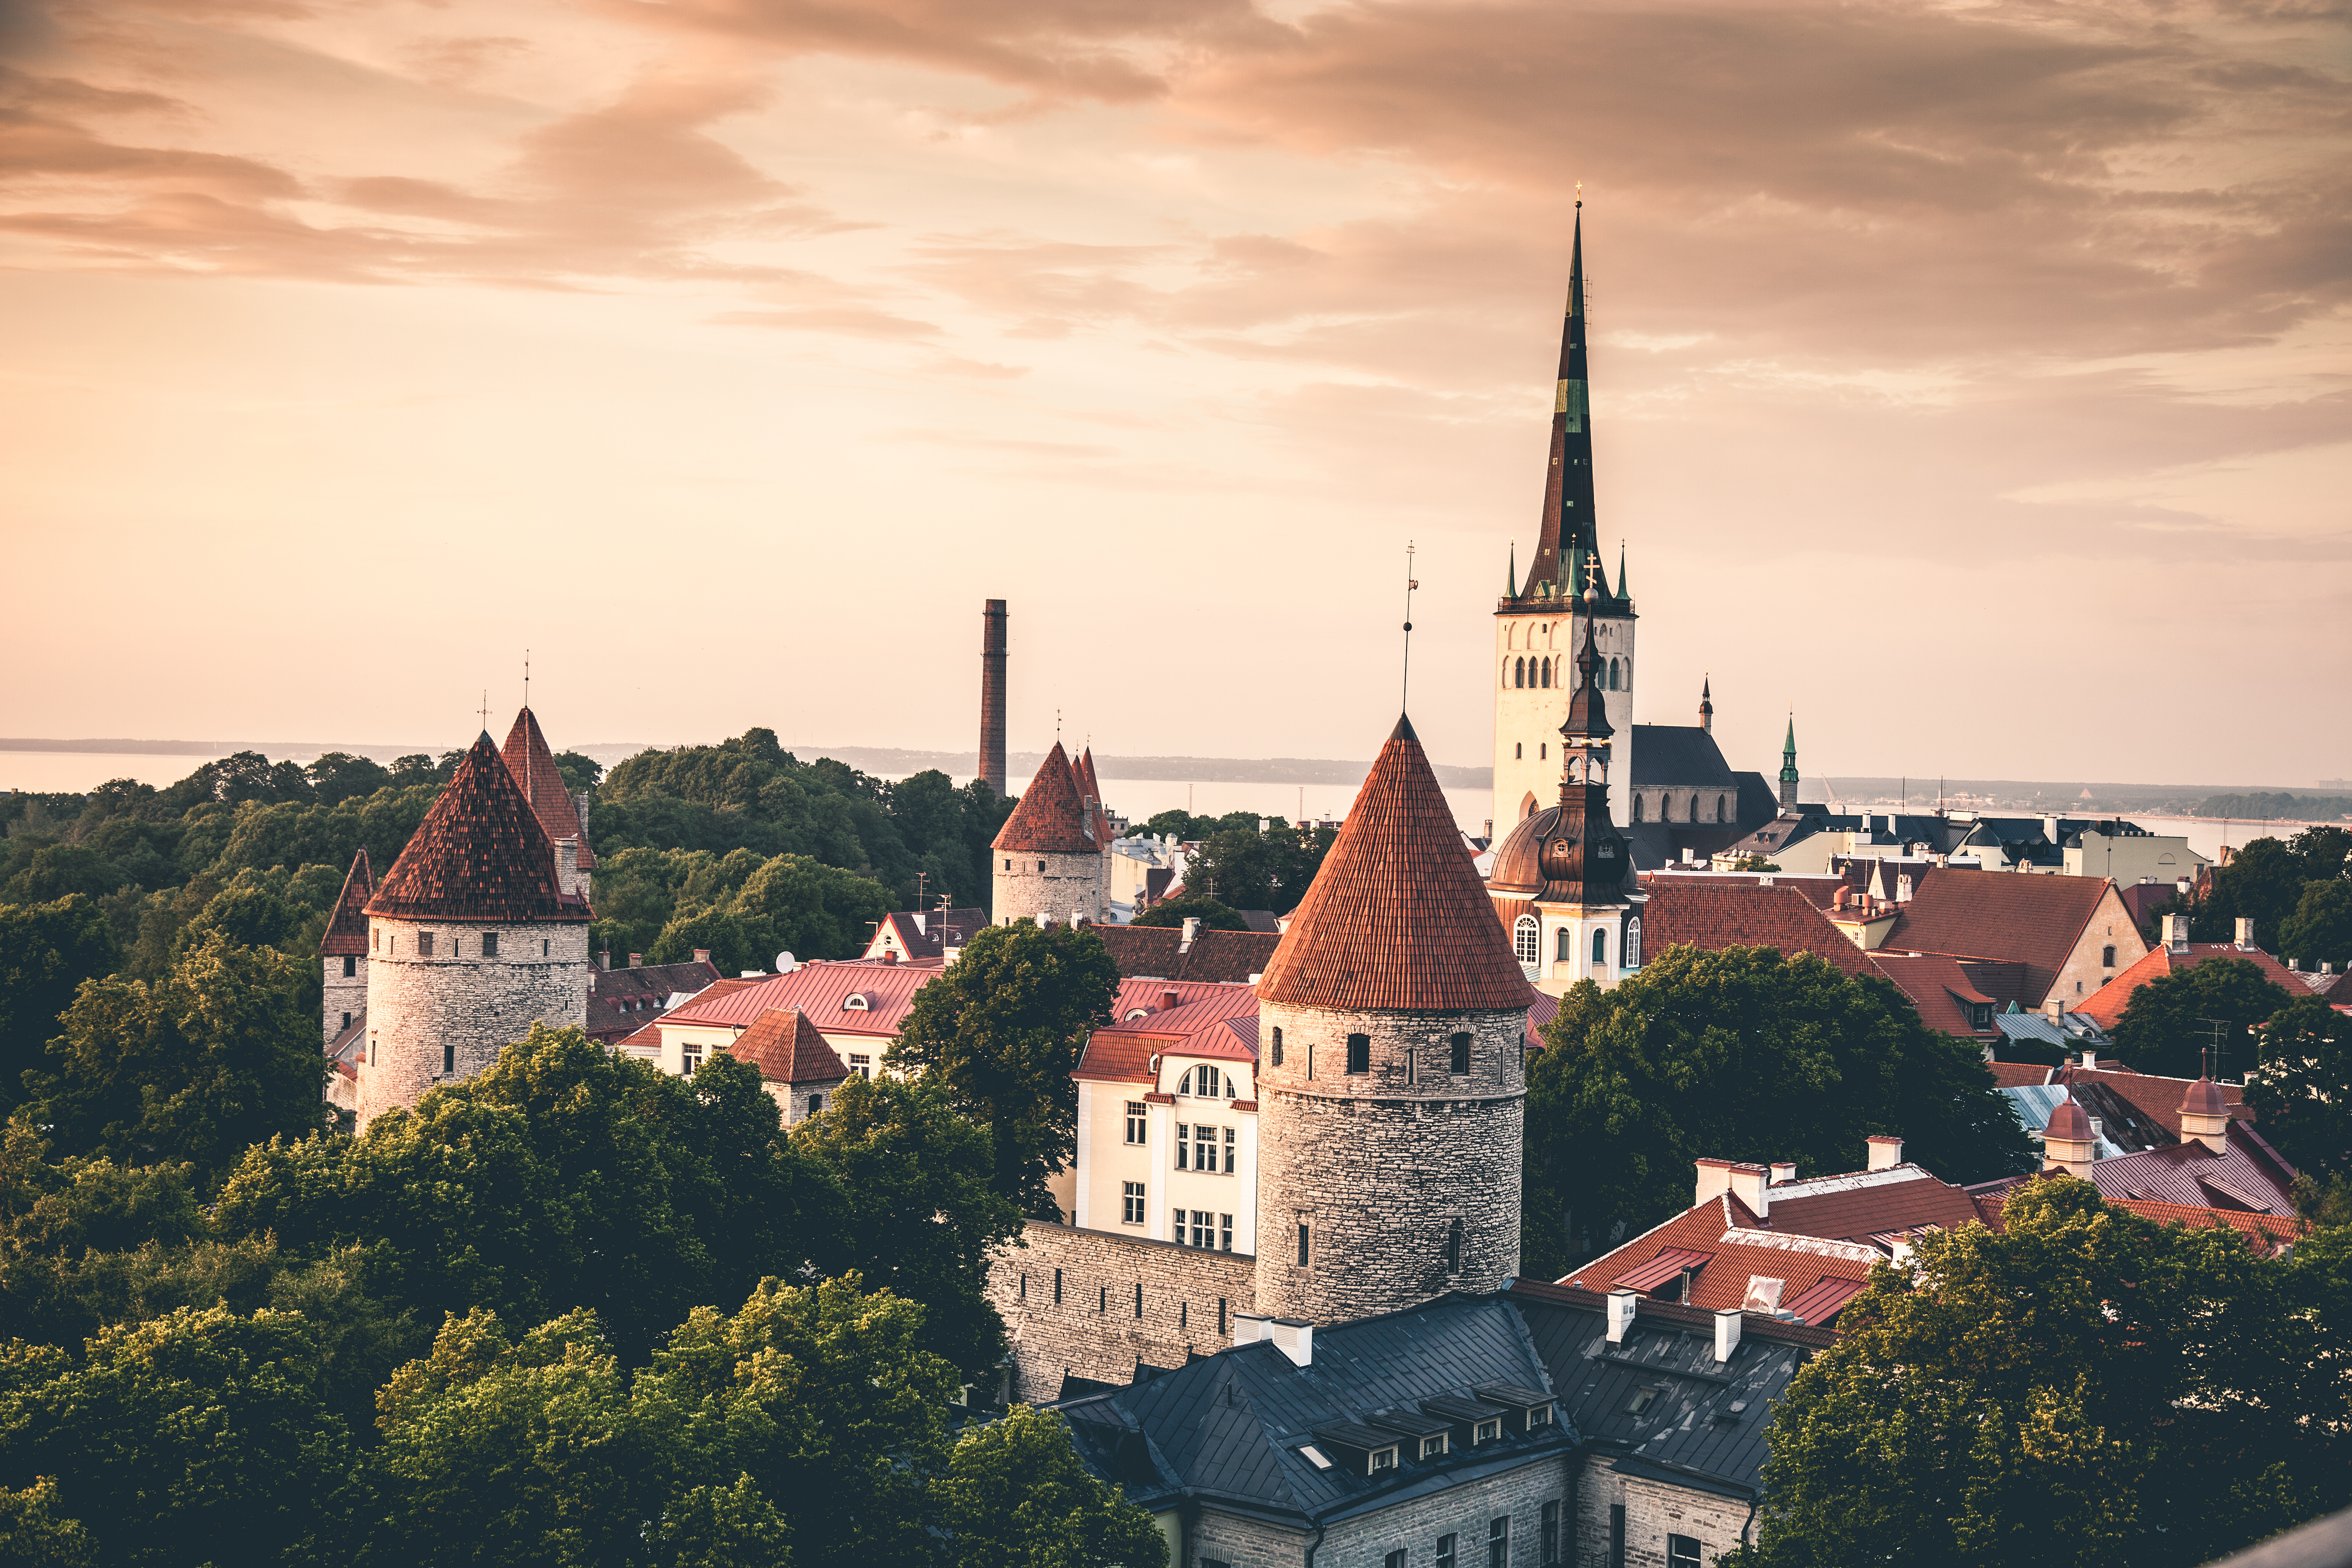 Tallín. Crisol de culturas - Lituania Circuito Repúblicas Bálticas